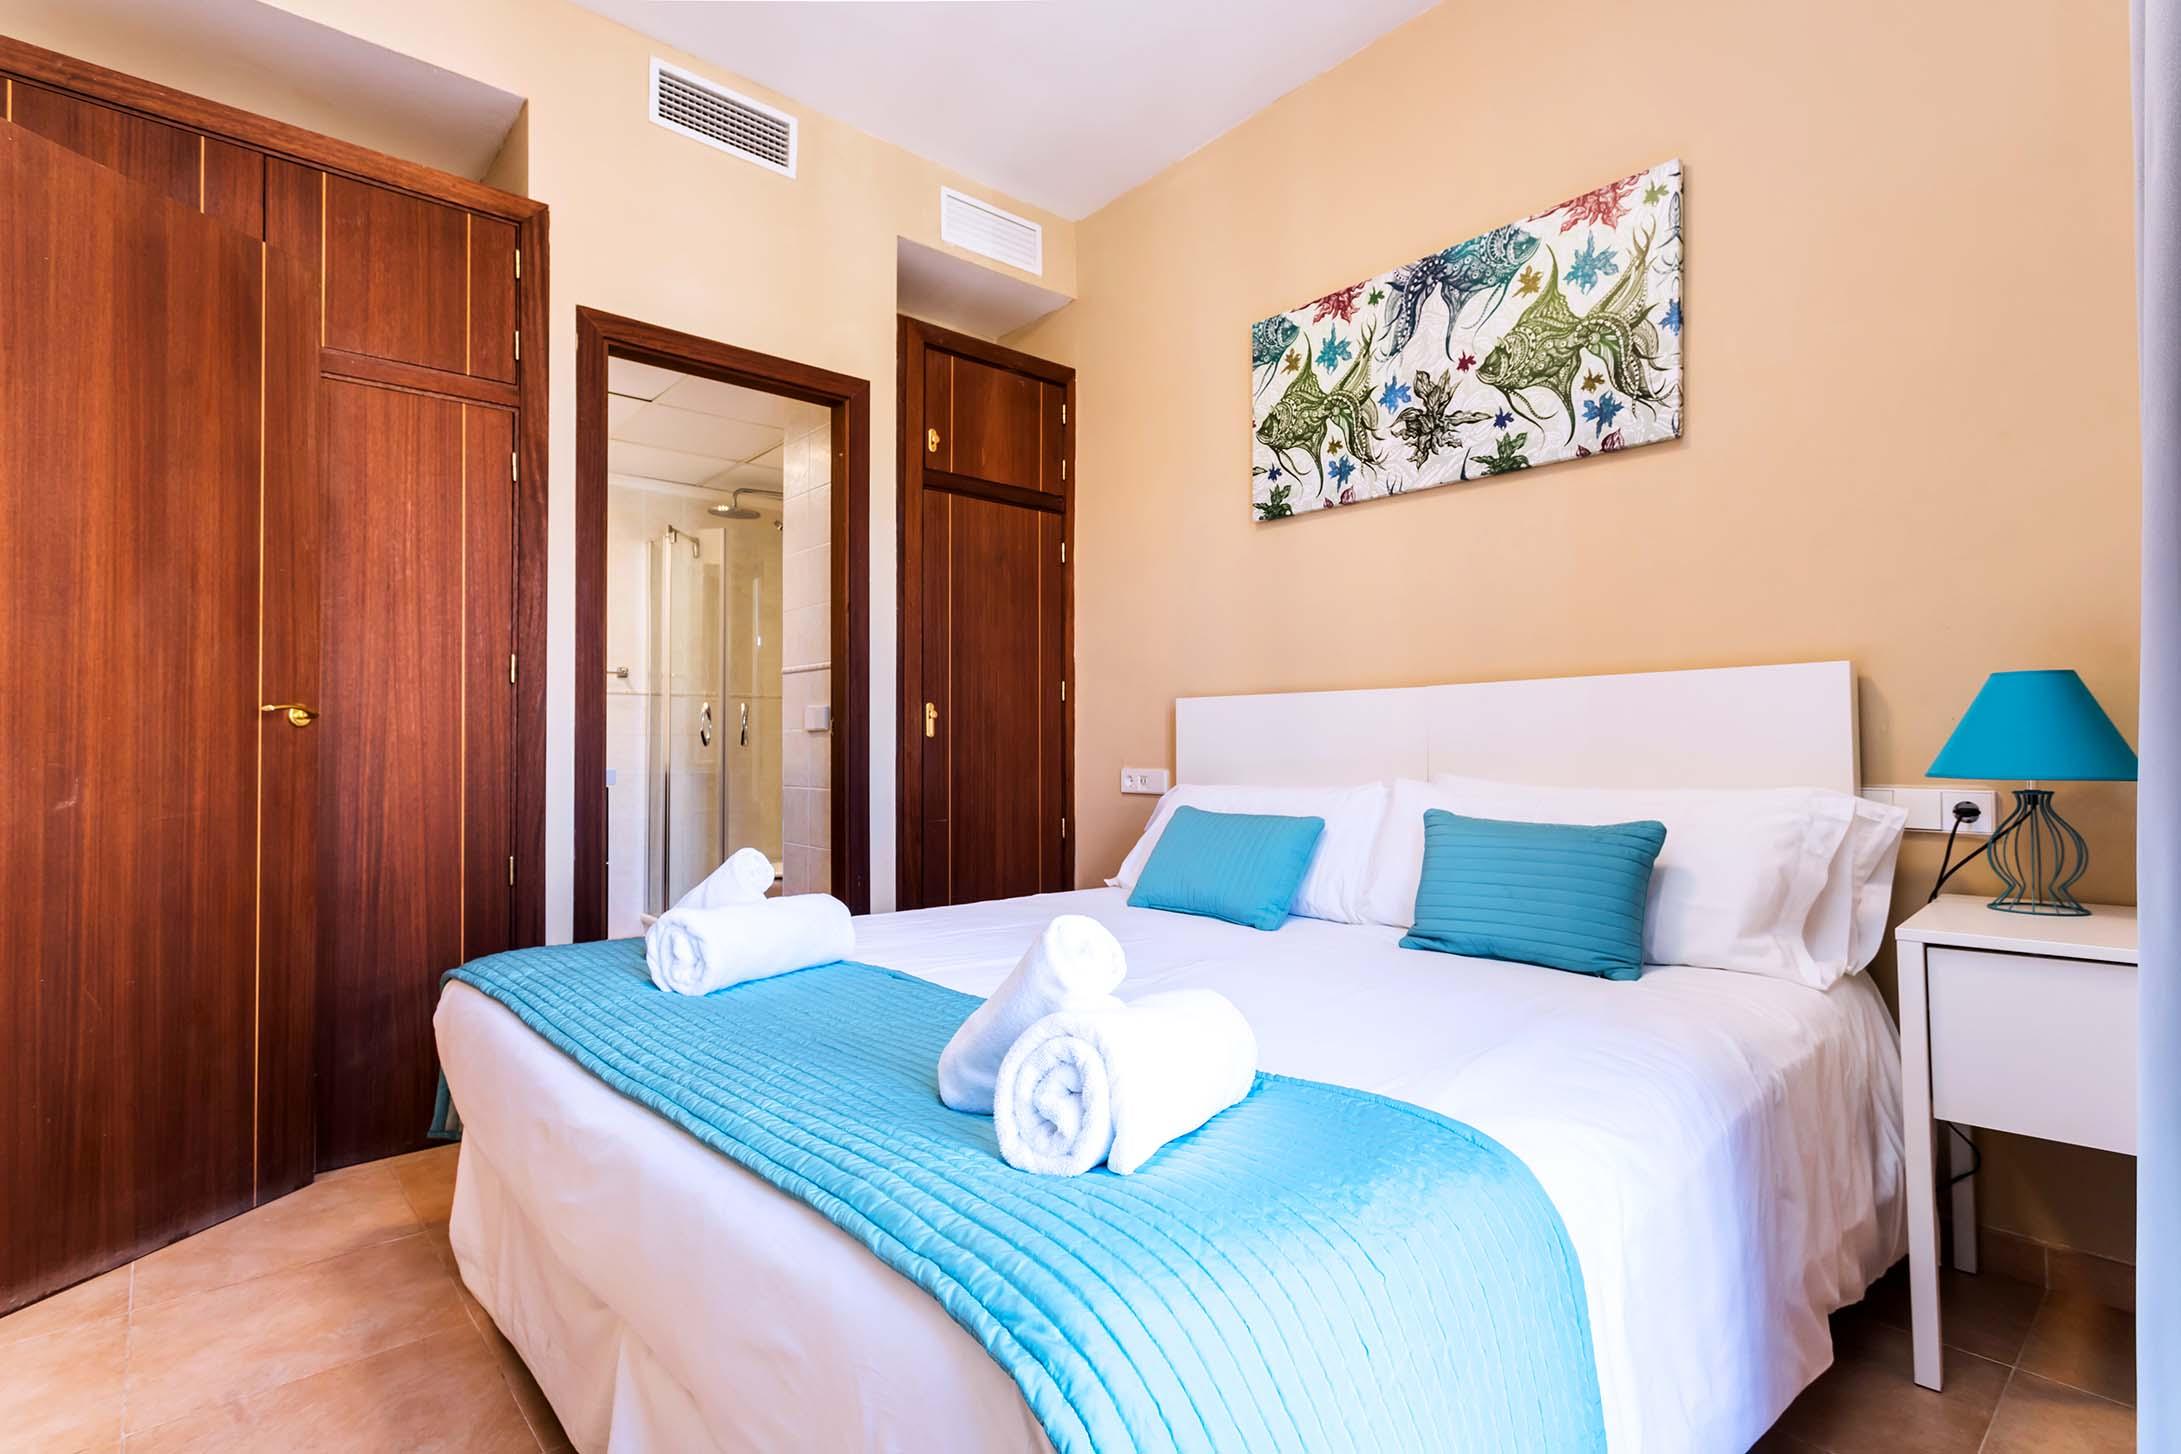 Borne-Suites-Apartamento-Superior-2-Pax-Palma-de-Mallorca-Habitación-1